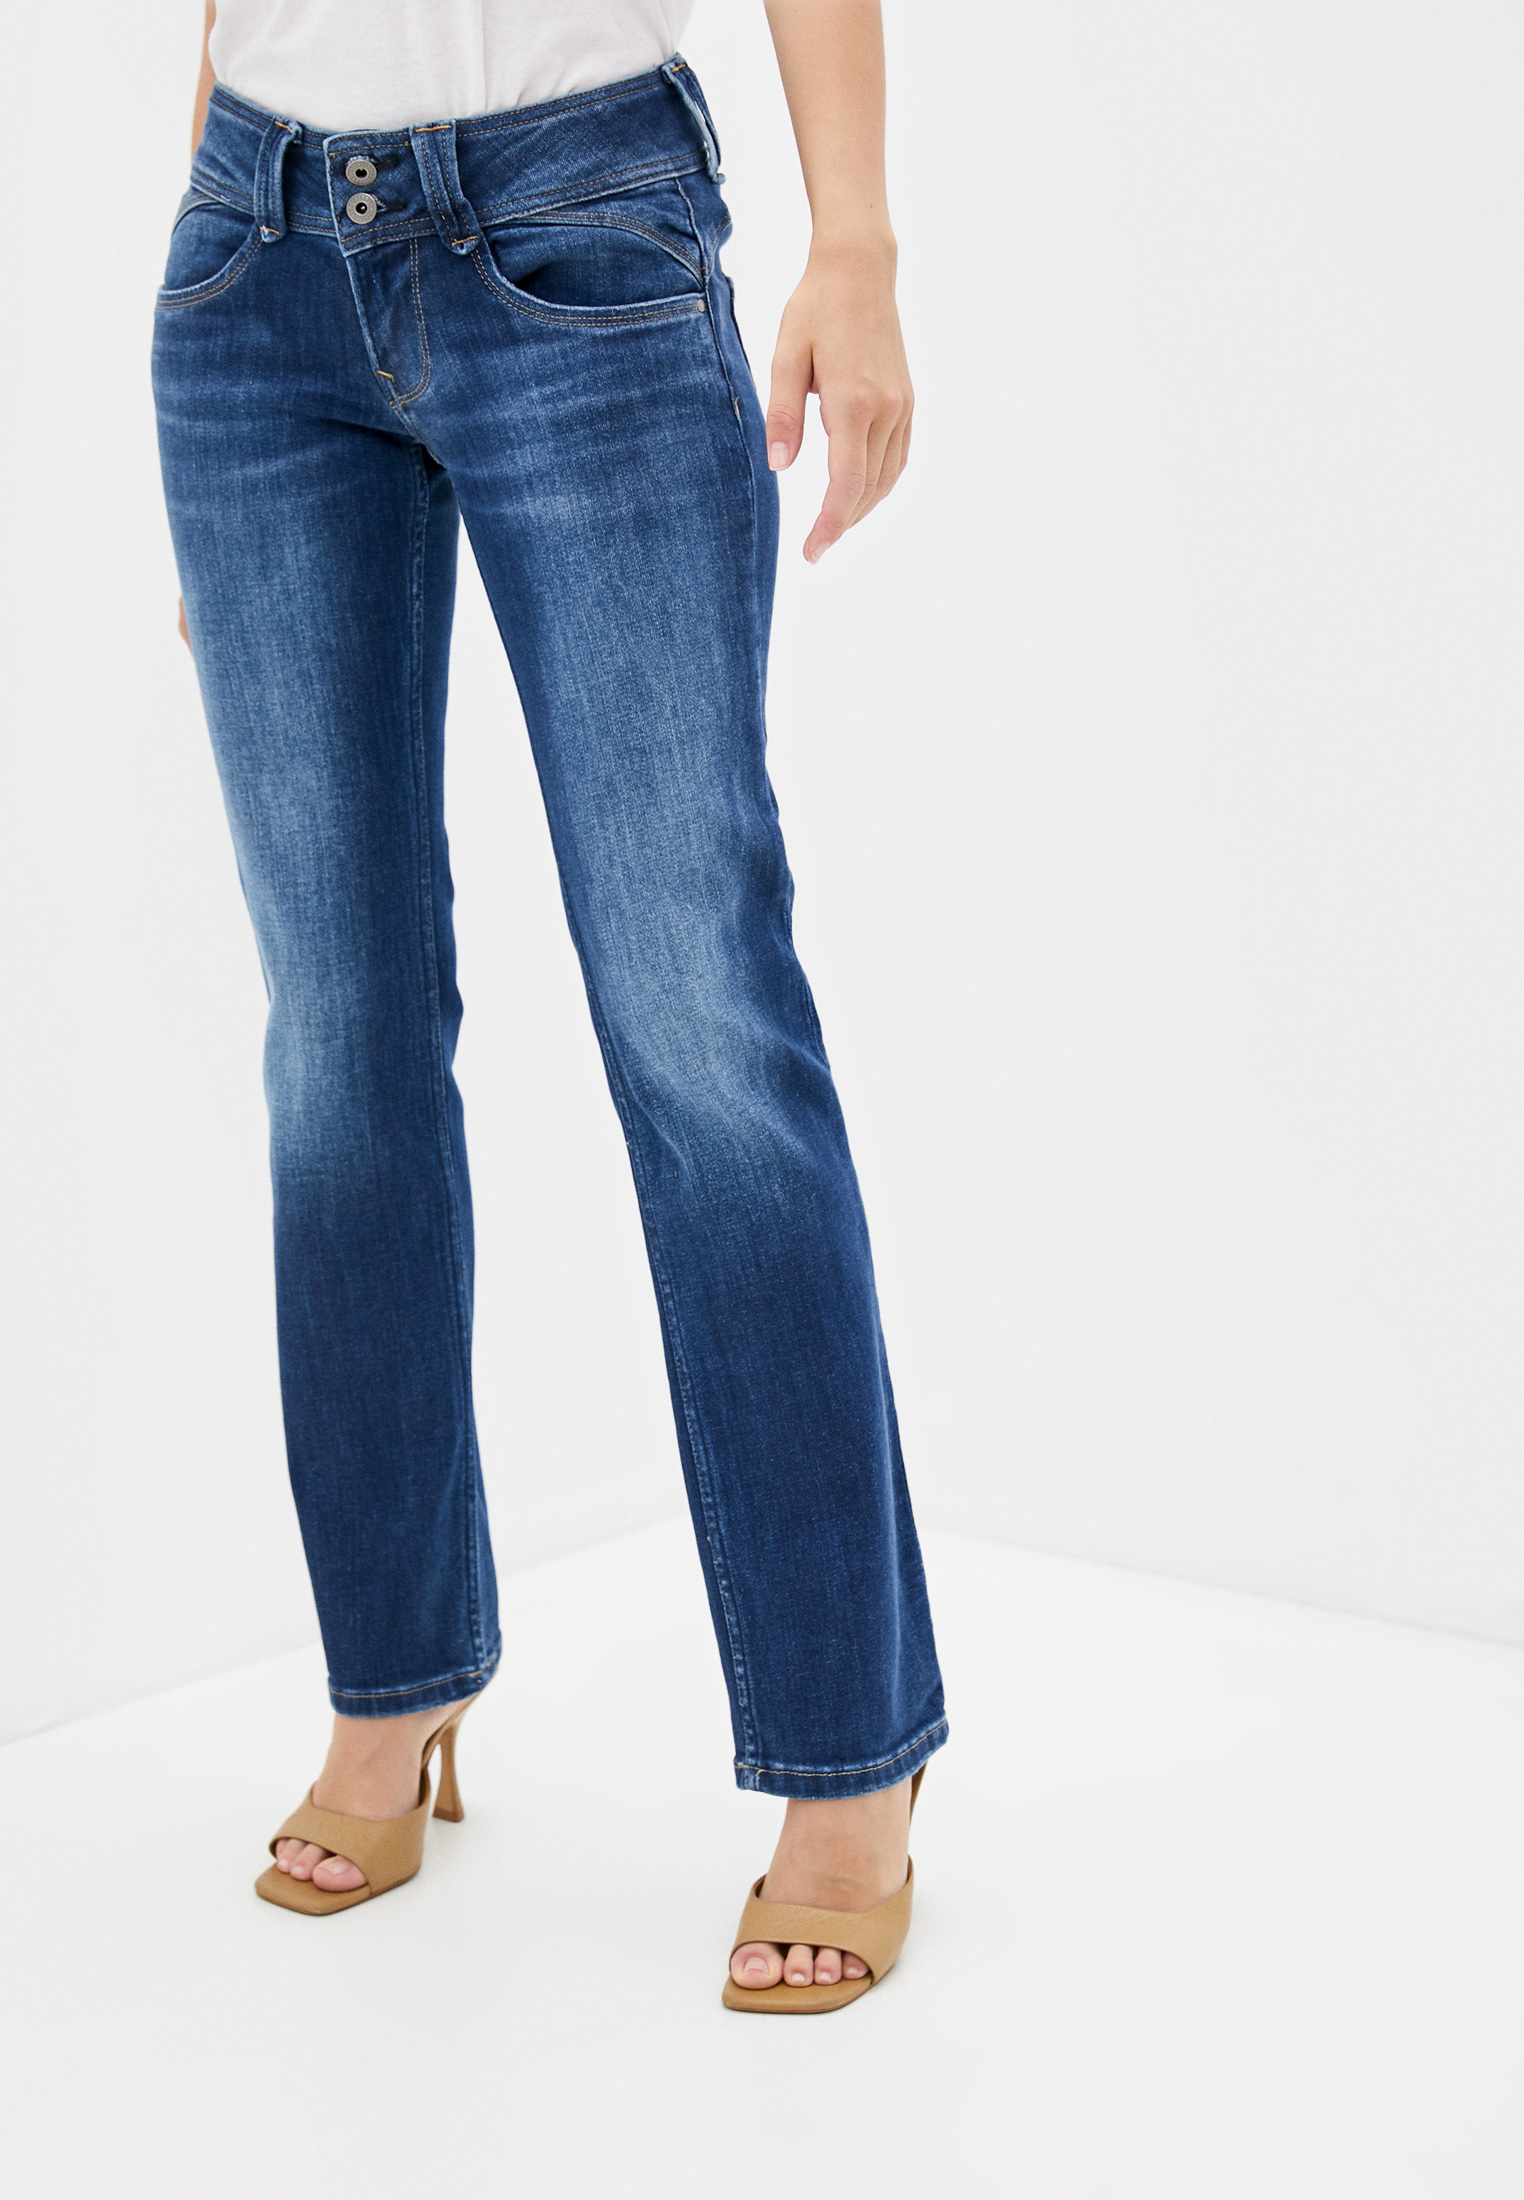 Прямые джинсы Pepe Jeans (Пепе Джинс) Джинсы Pepe Jeans